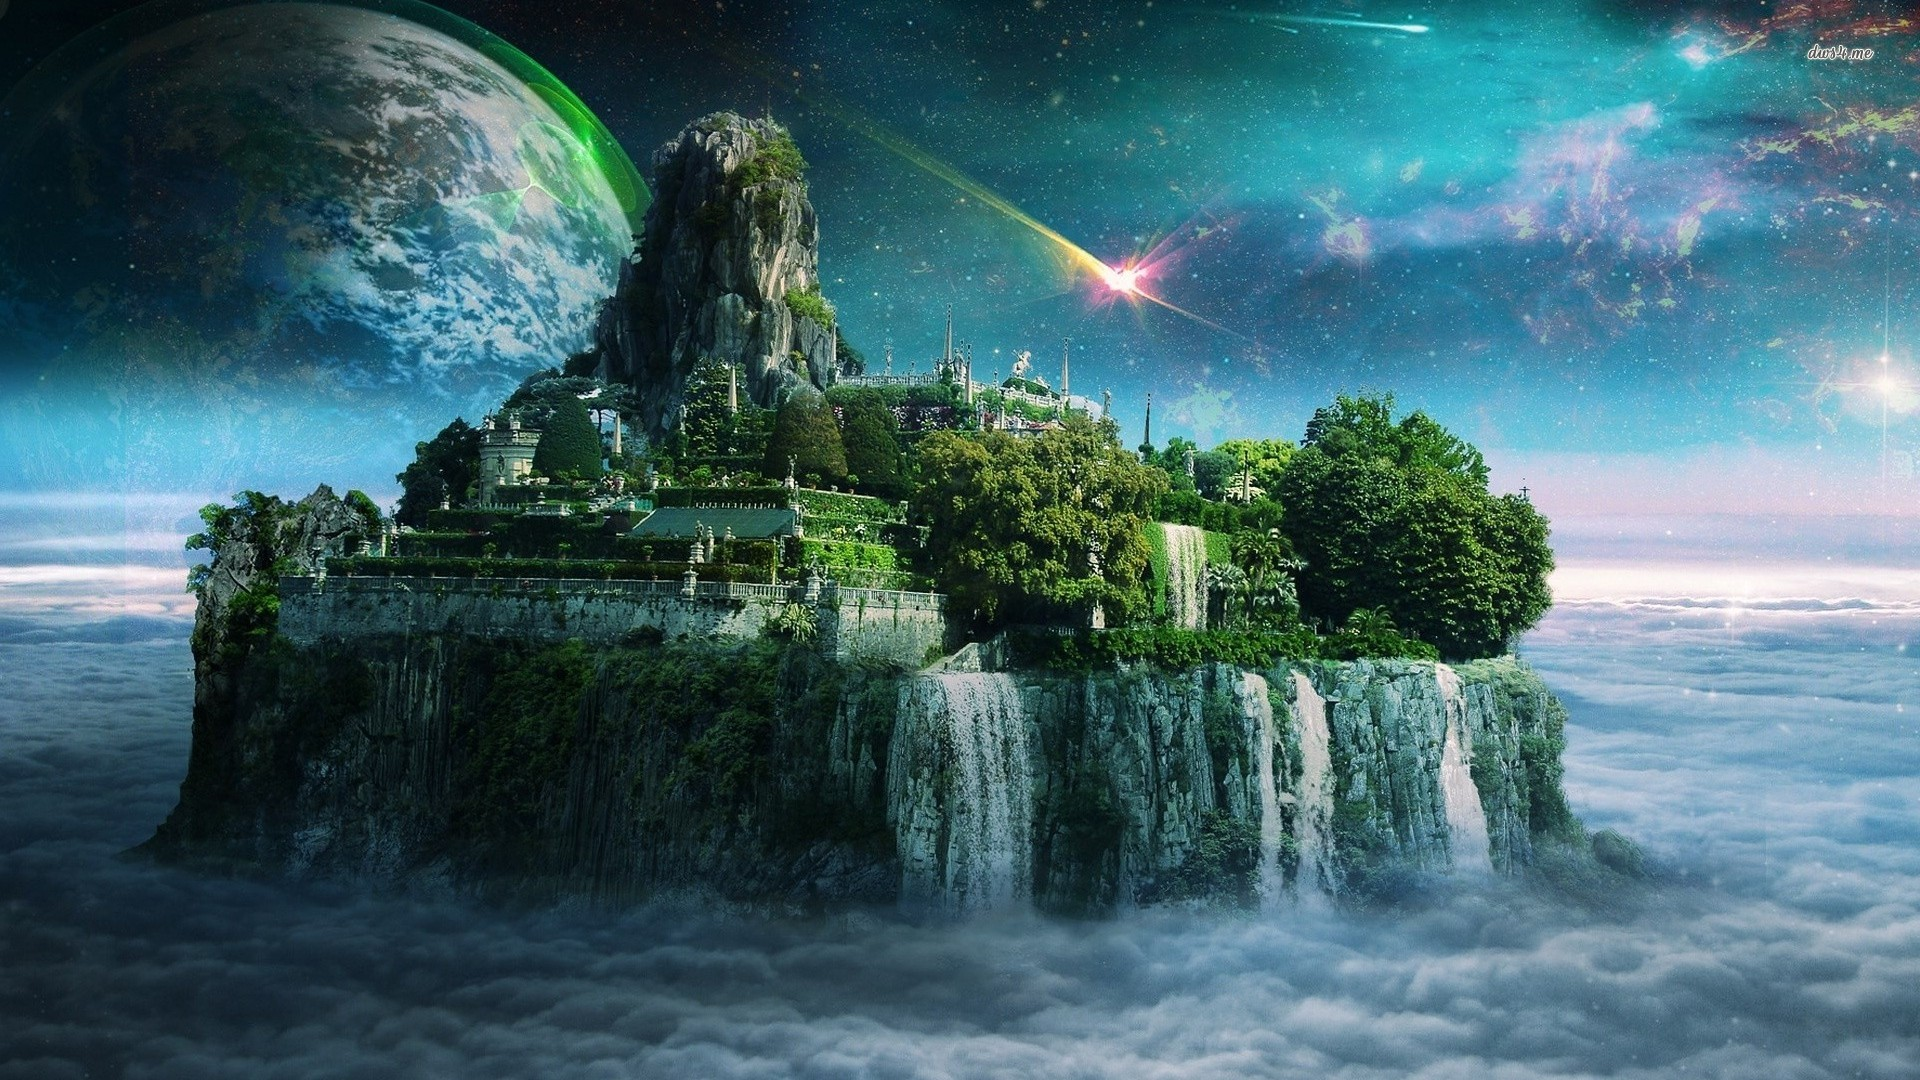 General 1920x1080 island water digital art fantasy art planet sky artwork